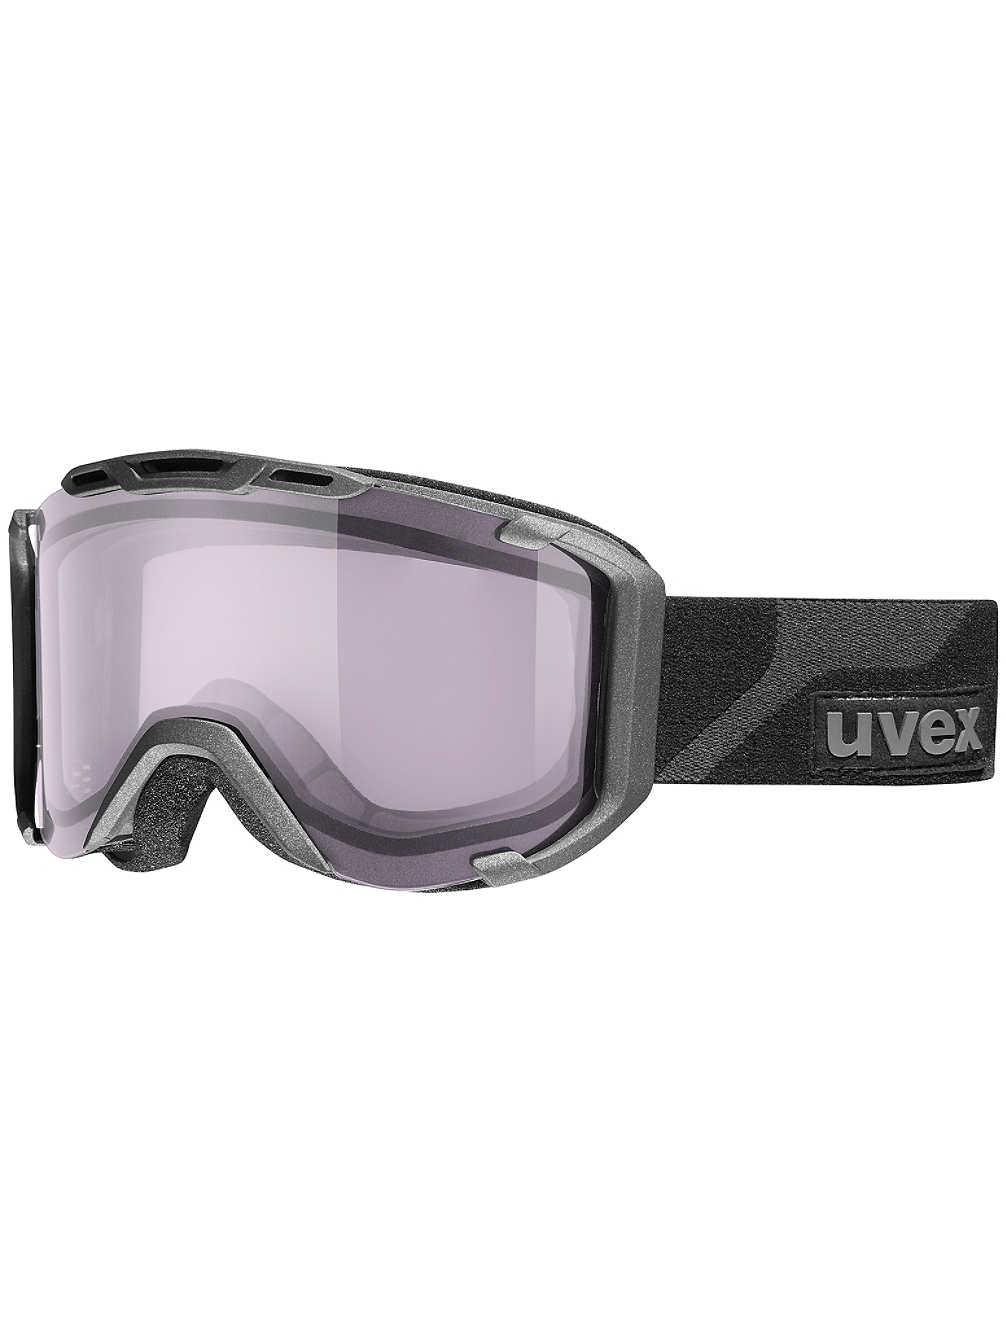 Uvex Snowstrike - de beste skibril van dit moment!